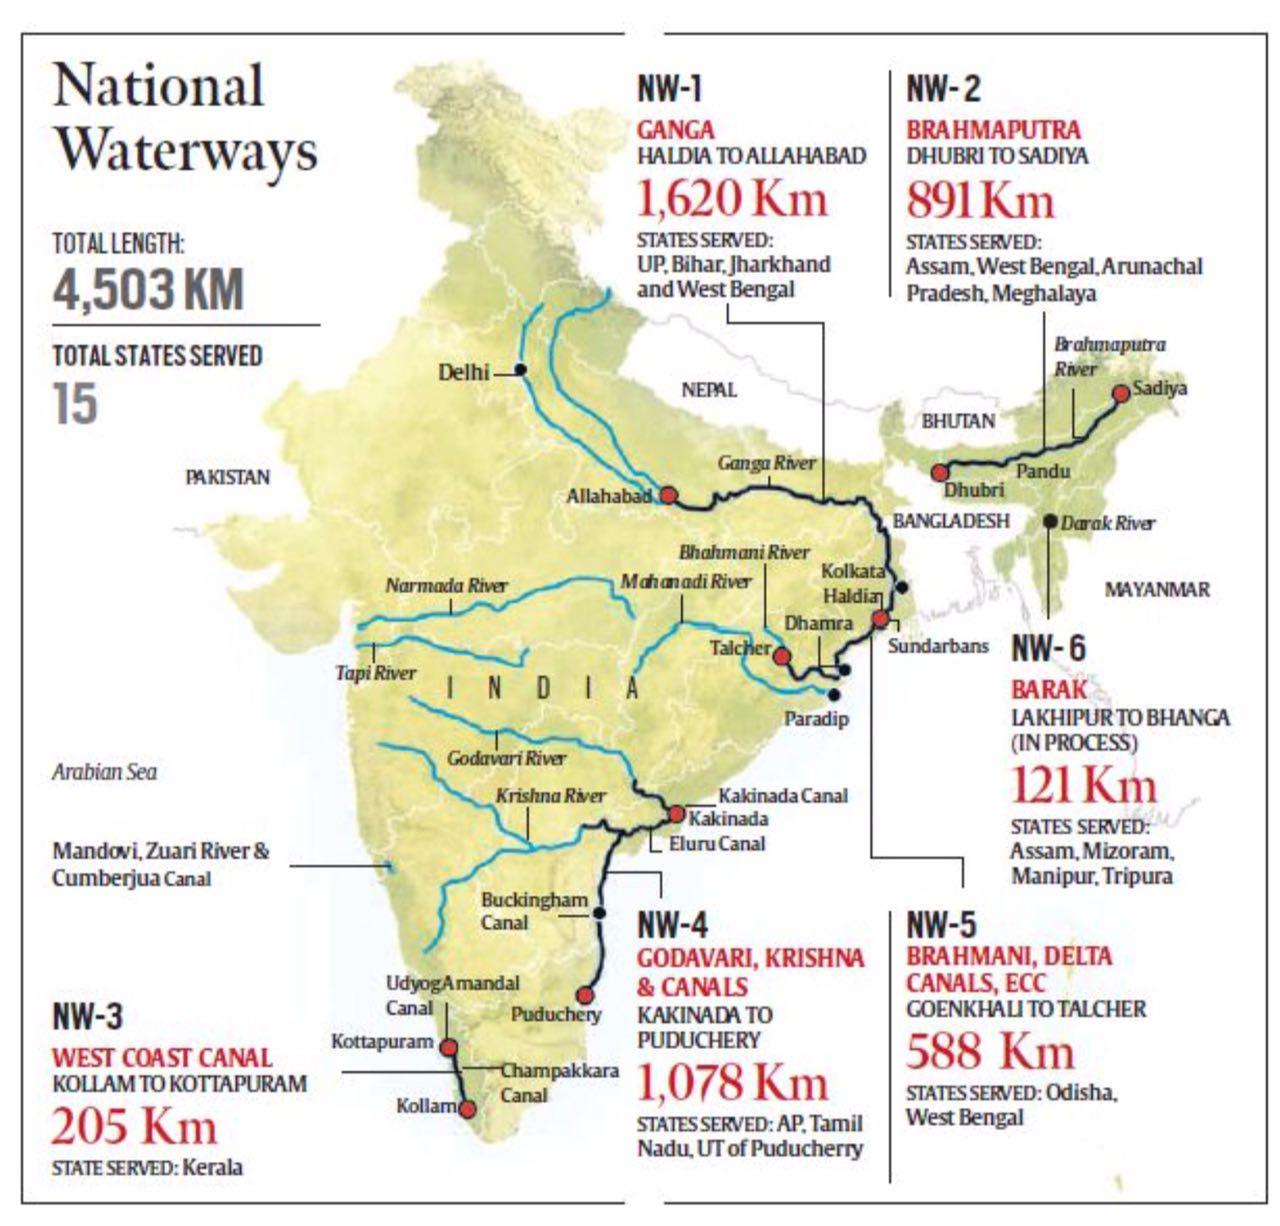 National Waterways In India